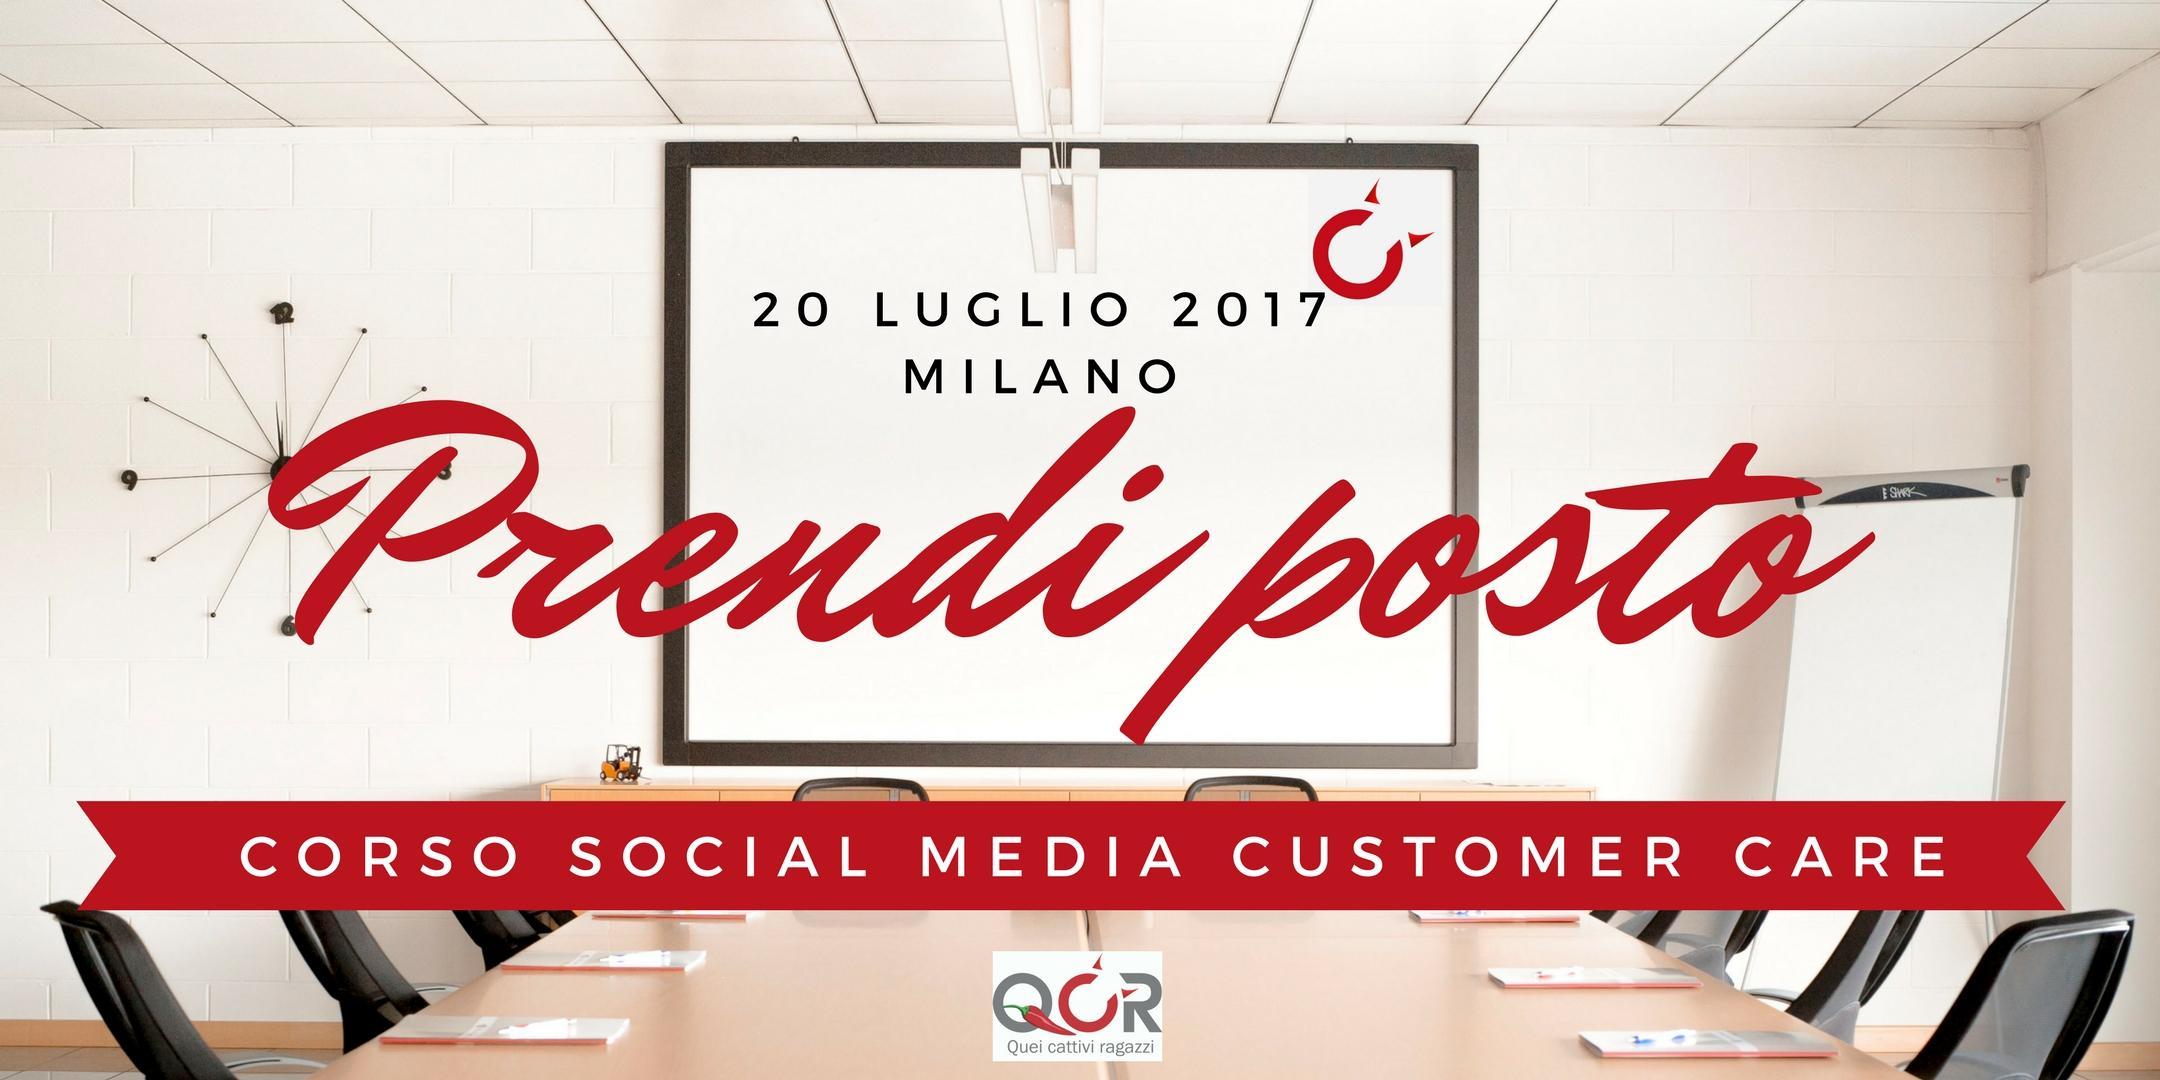 Corso Social Media Customer Care